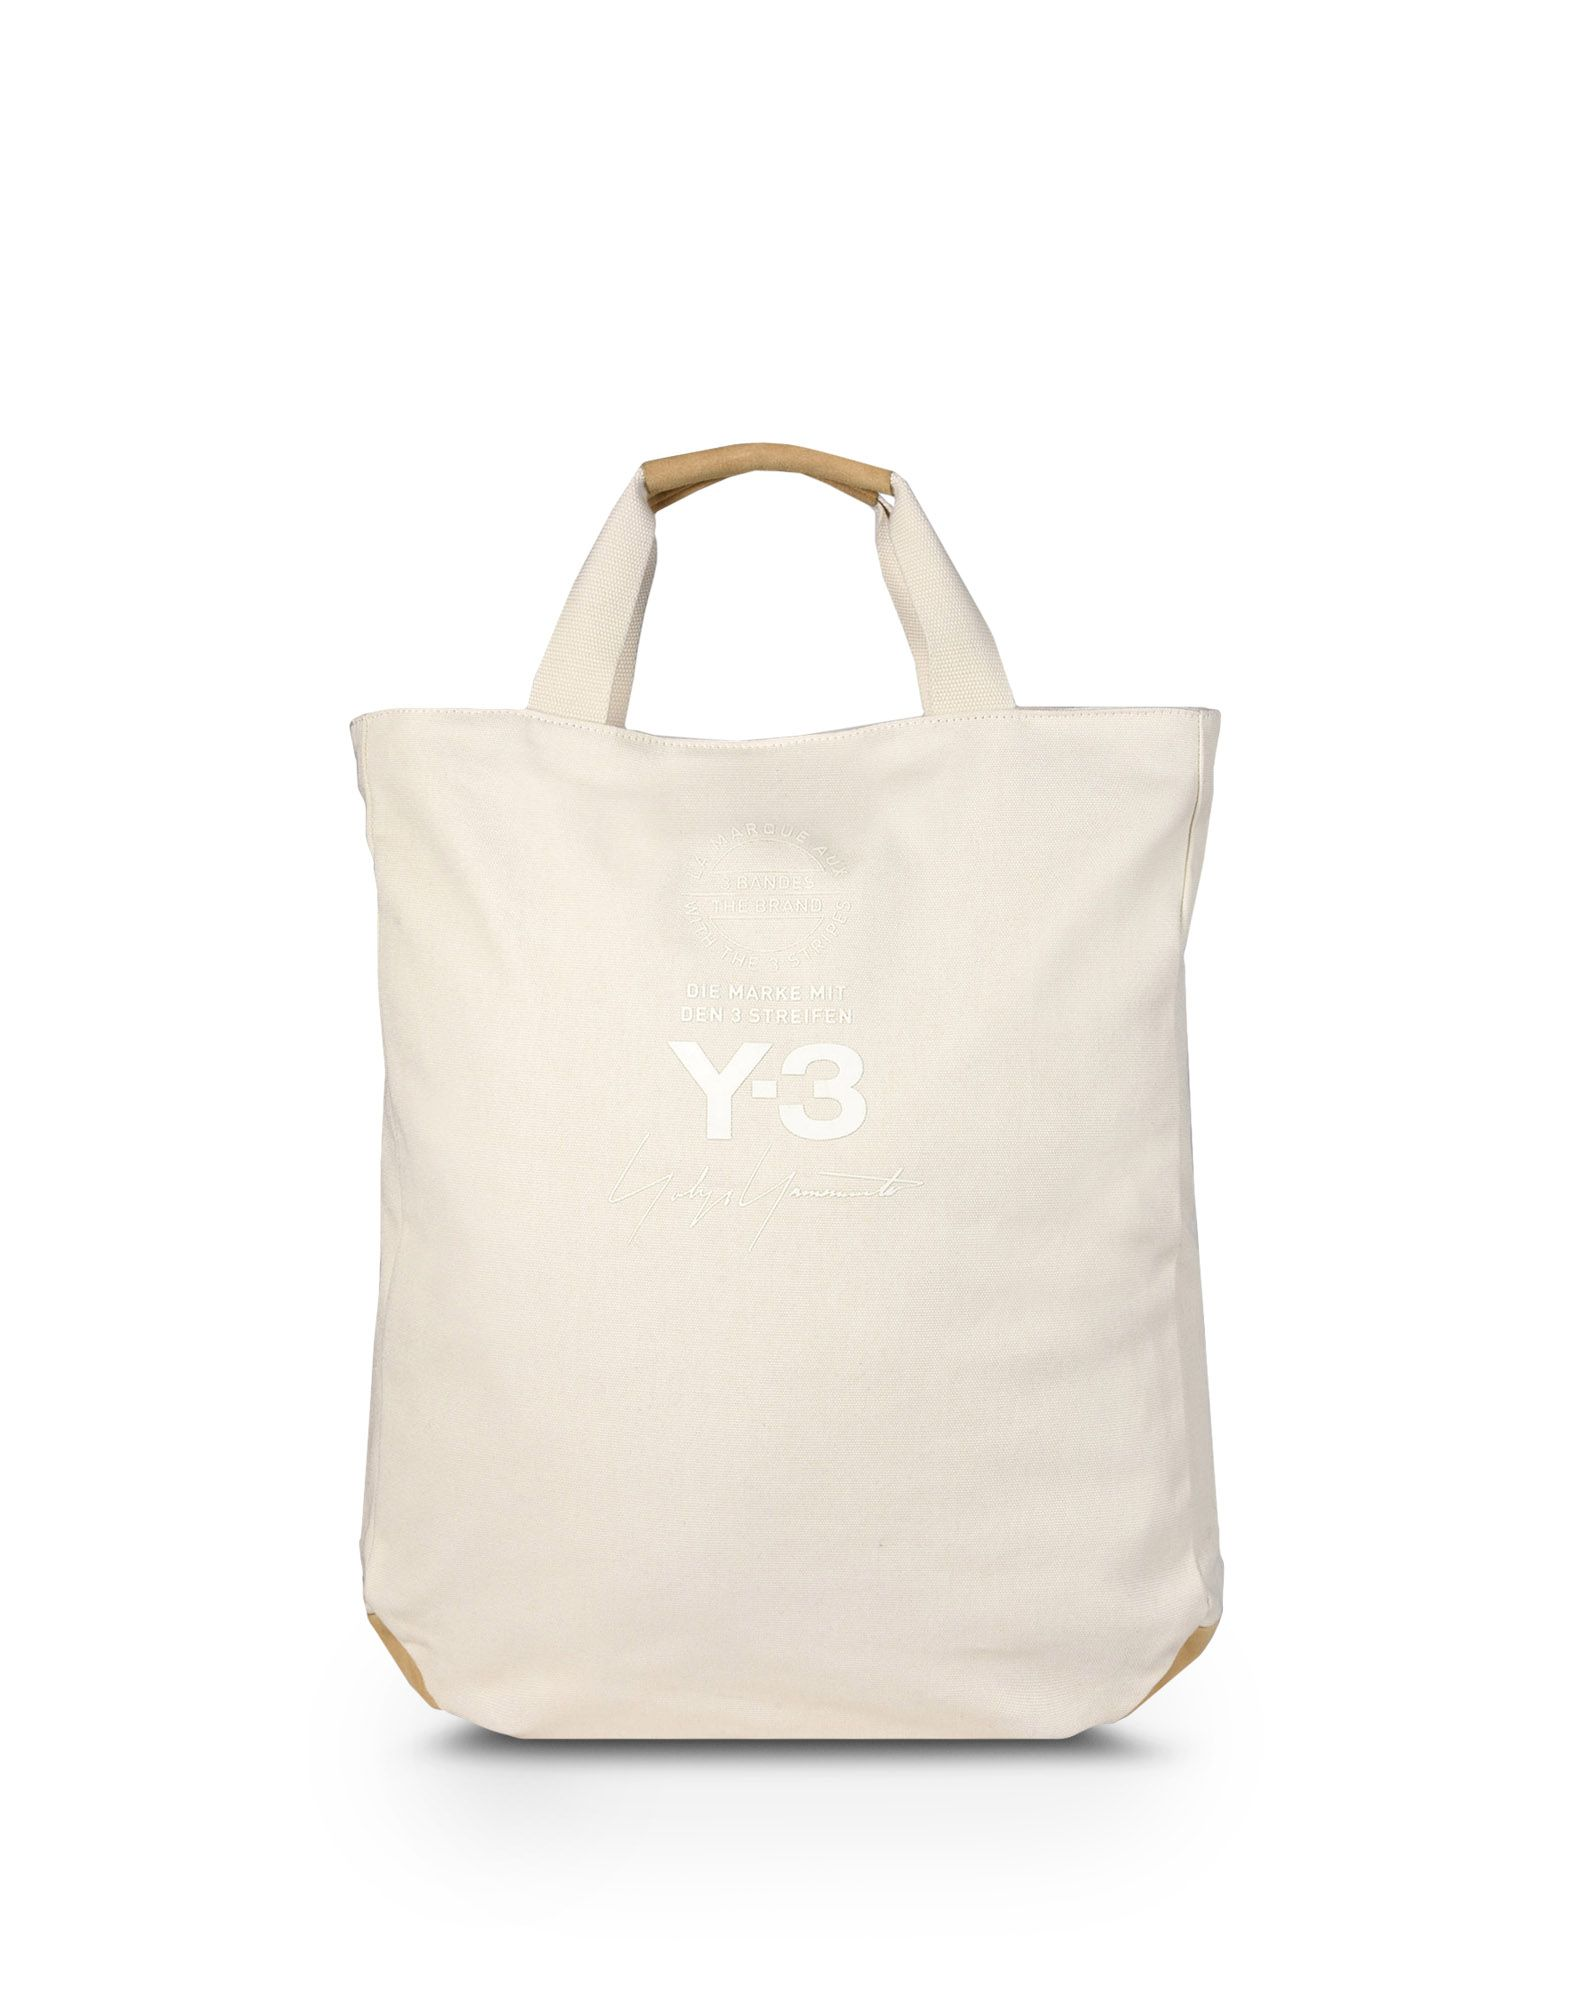 Y-3 Y-3 TOTE BAG Средняя сумка из текстиля E f